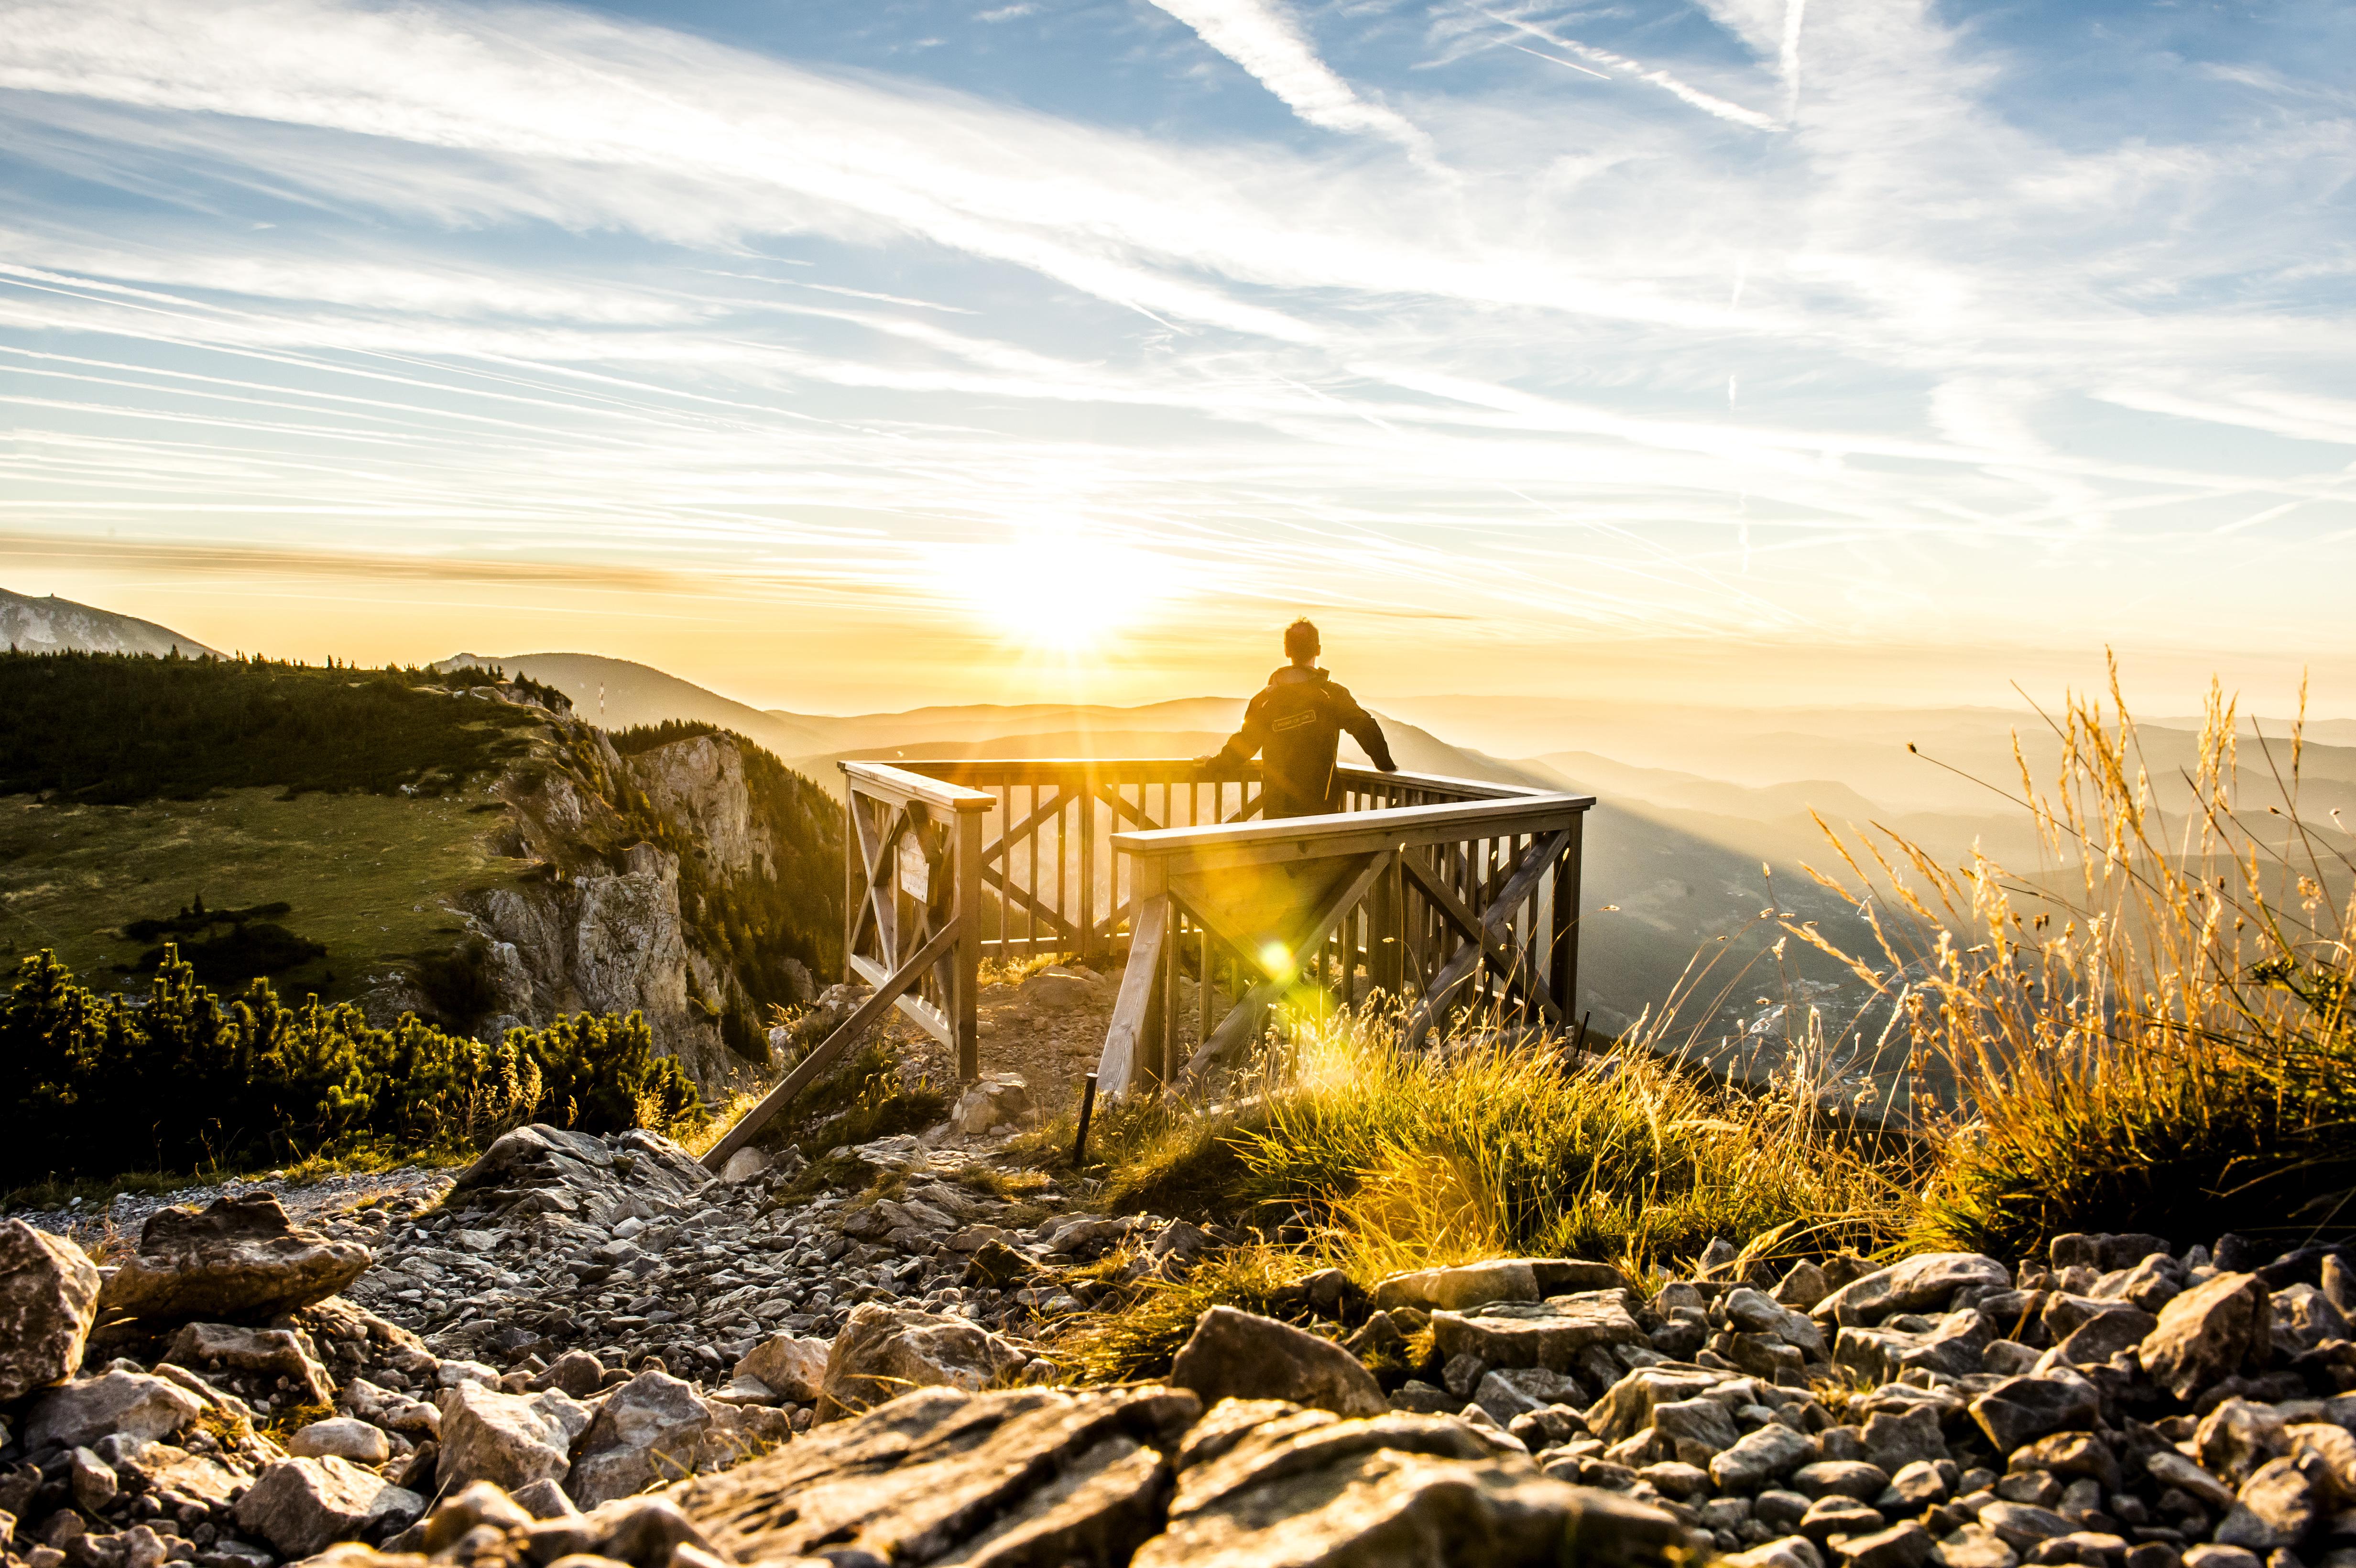 Bergsommer auf der Rax / Dolní Rakousko, Robert Herbst